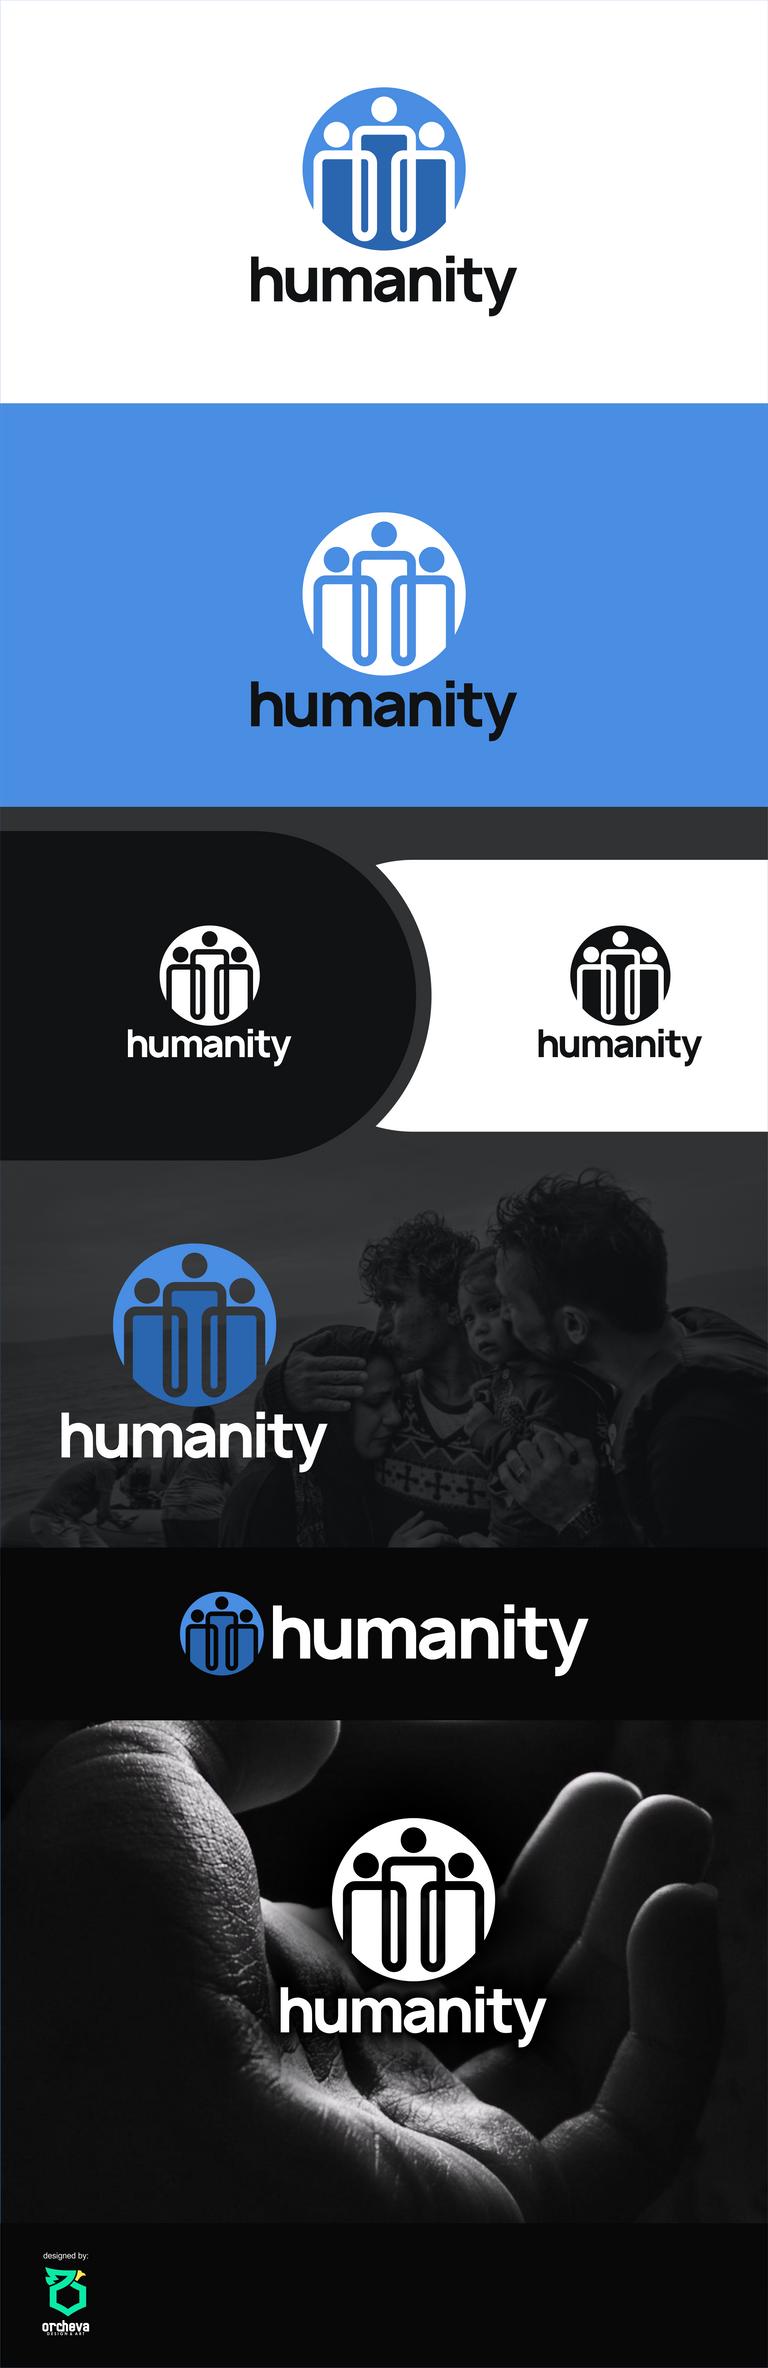 HUMANITY LOGO 1.png